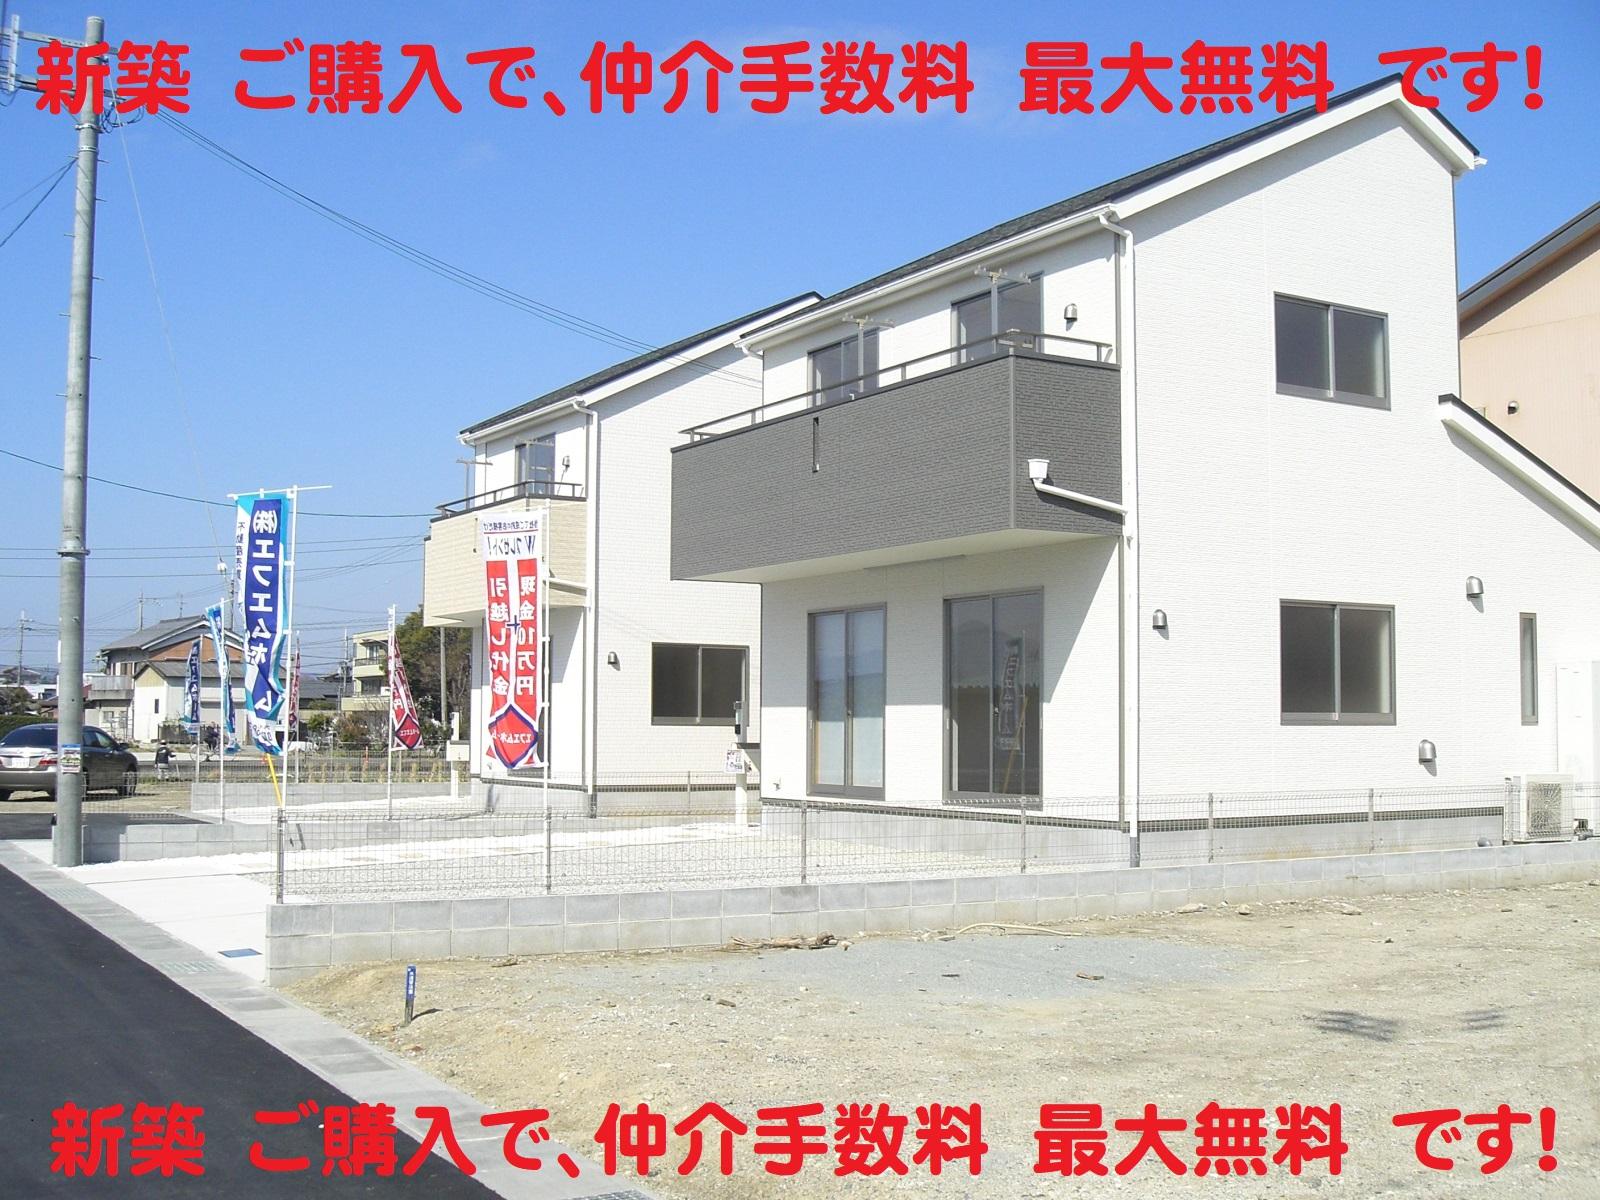 奈良県 新築 ビート住建 広陵町 お買い得 仲介手数料 最大無料